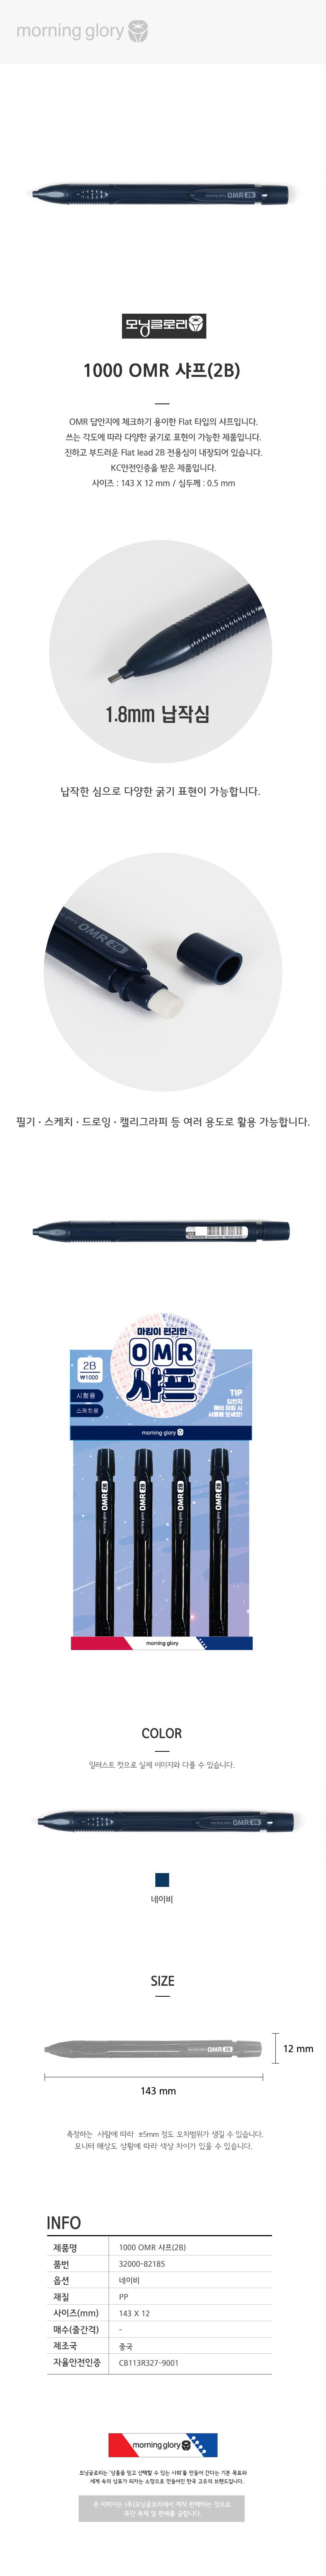 1000 OMR 샤프(2B) - 주식회사 다나통상, 1,000원, 샤프, 샤프